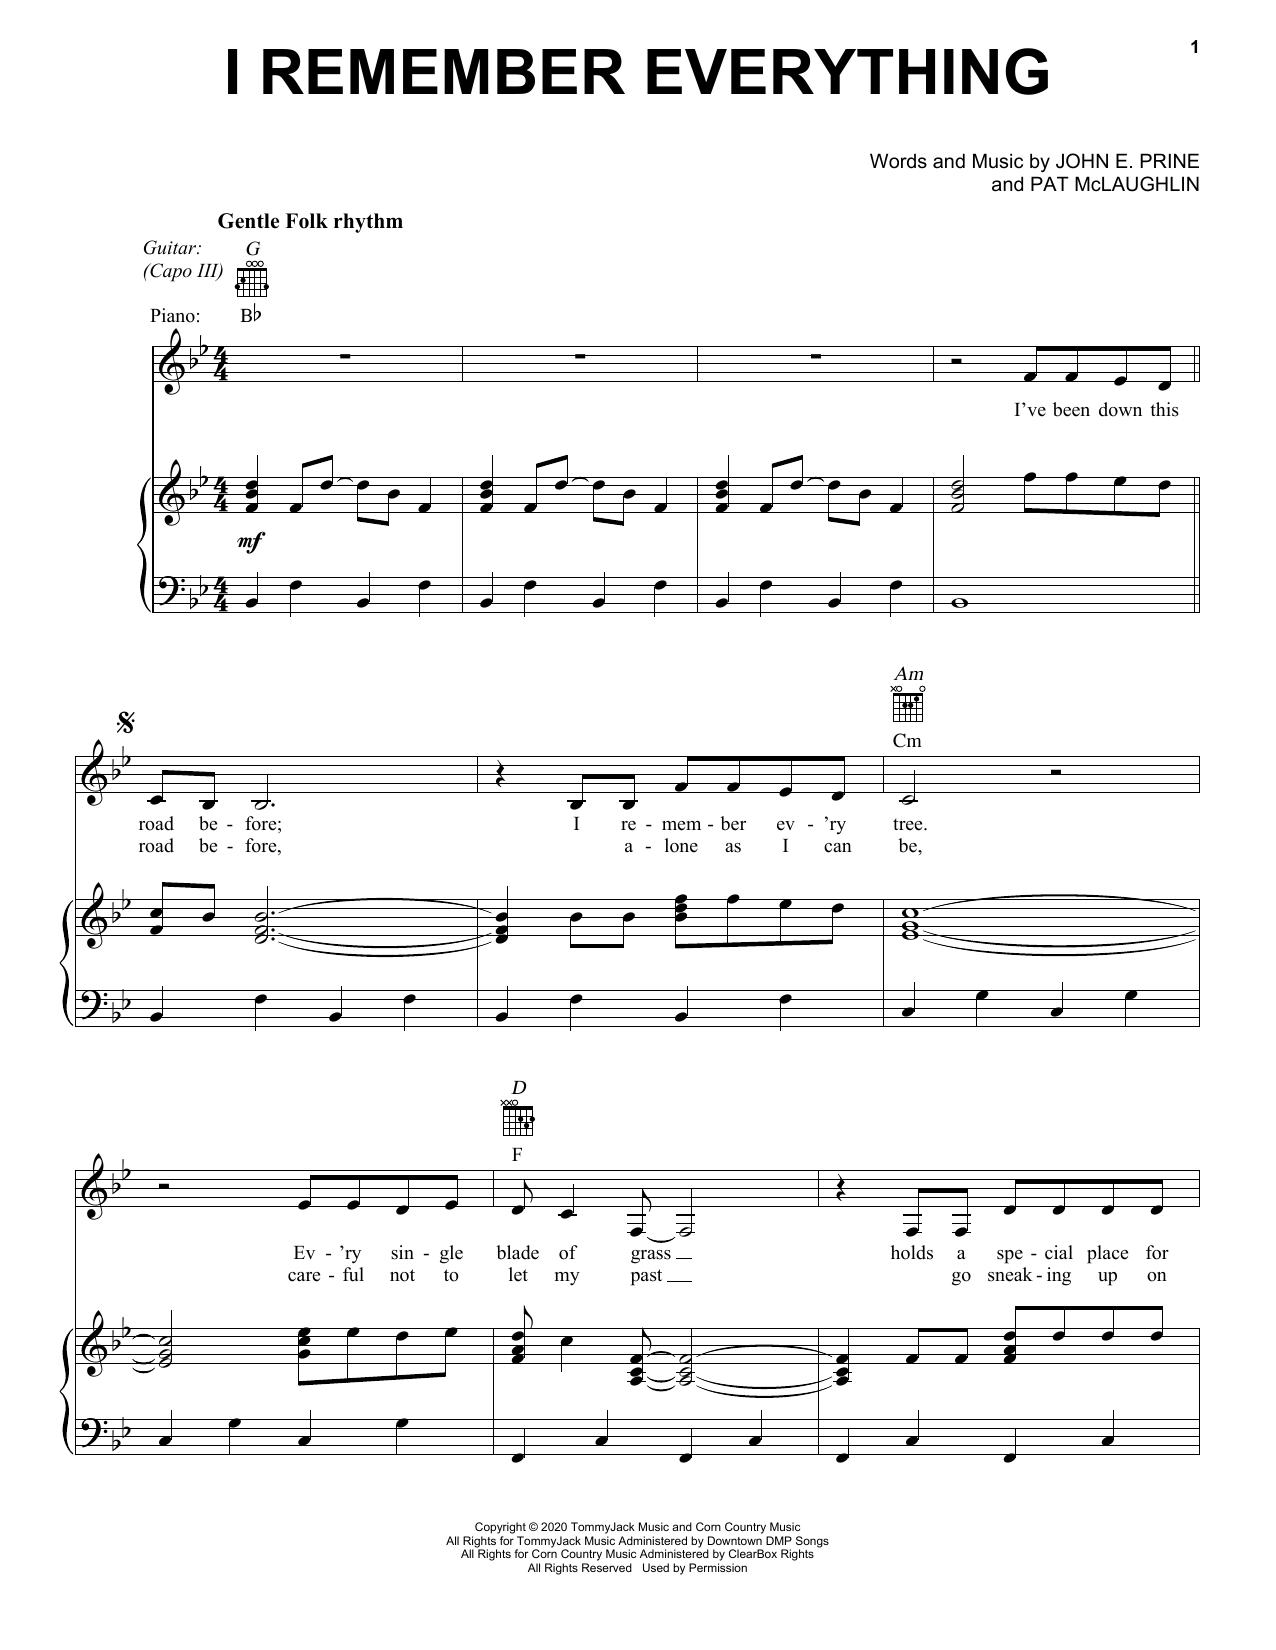 John Prine I Remember Everything sheet music notes and chords. Download Printable PDF.